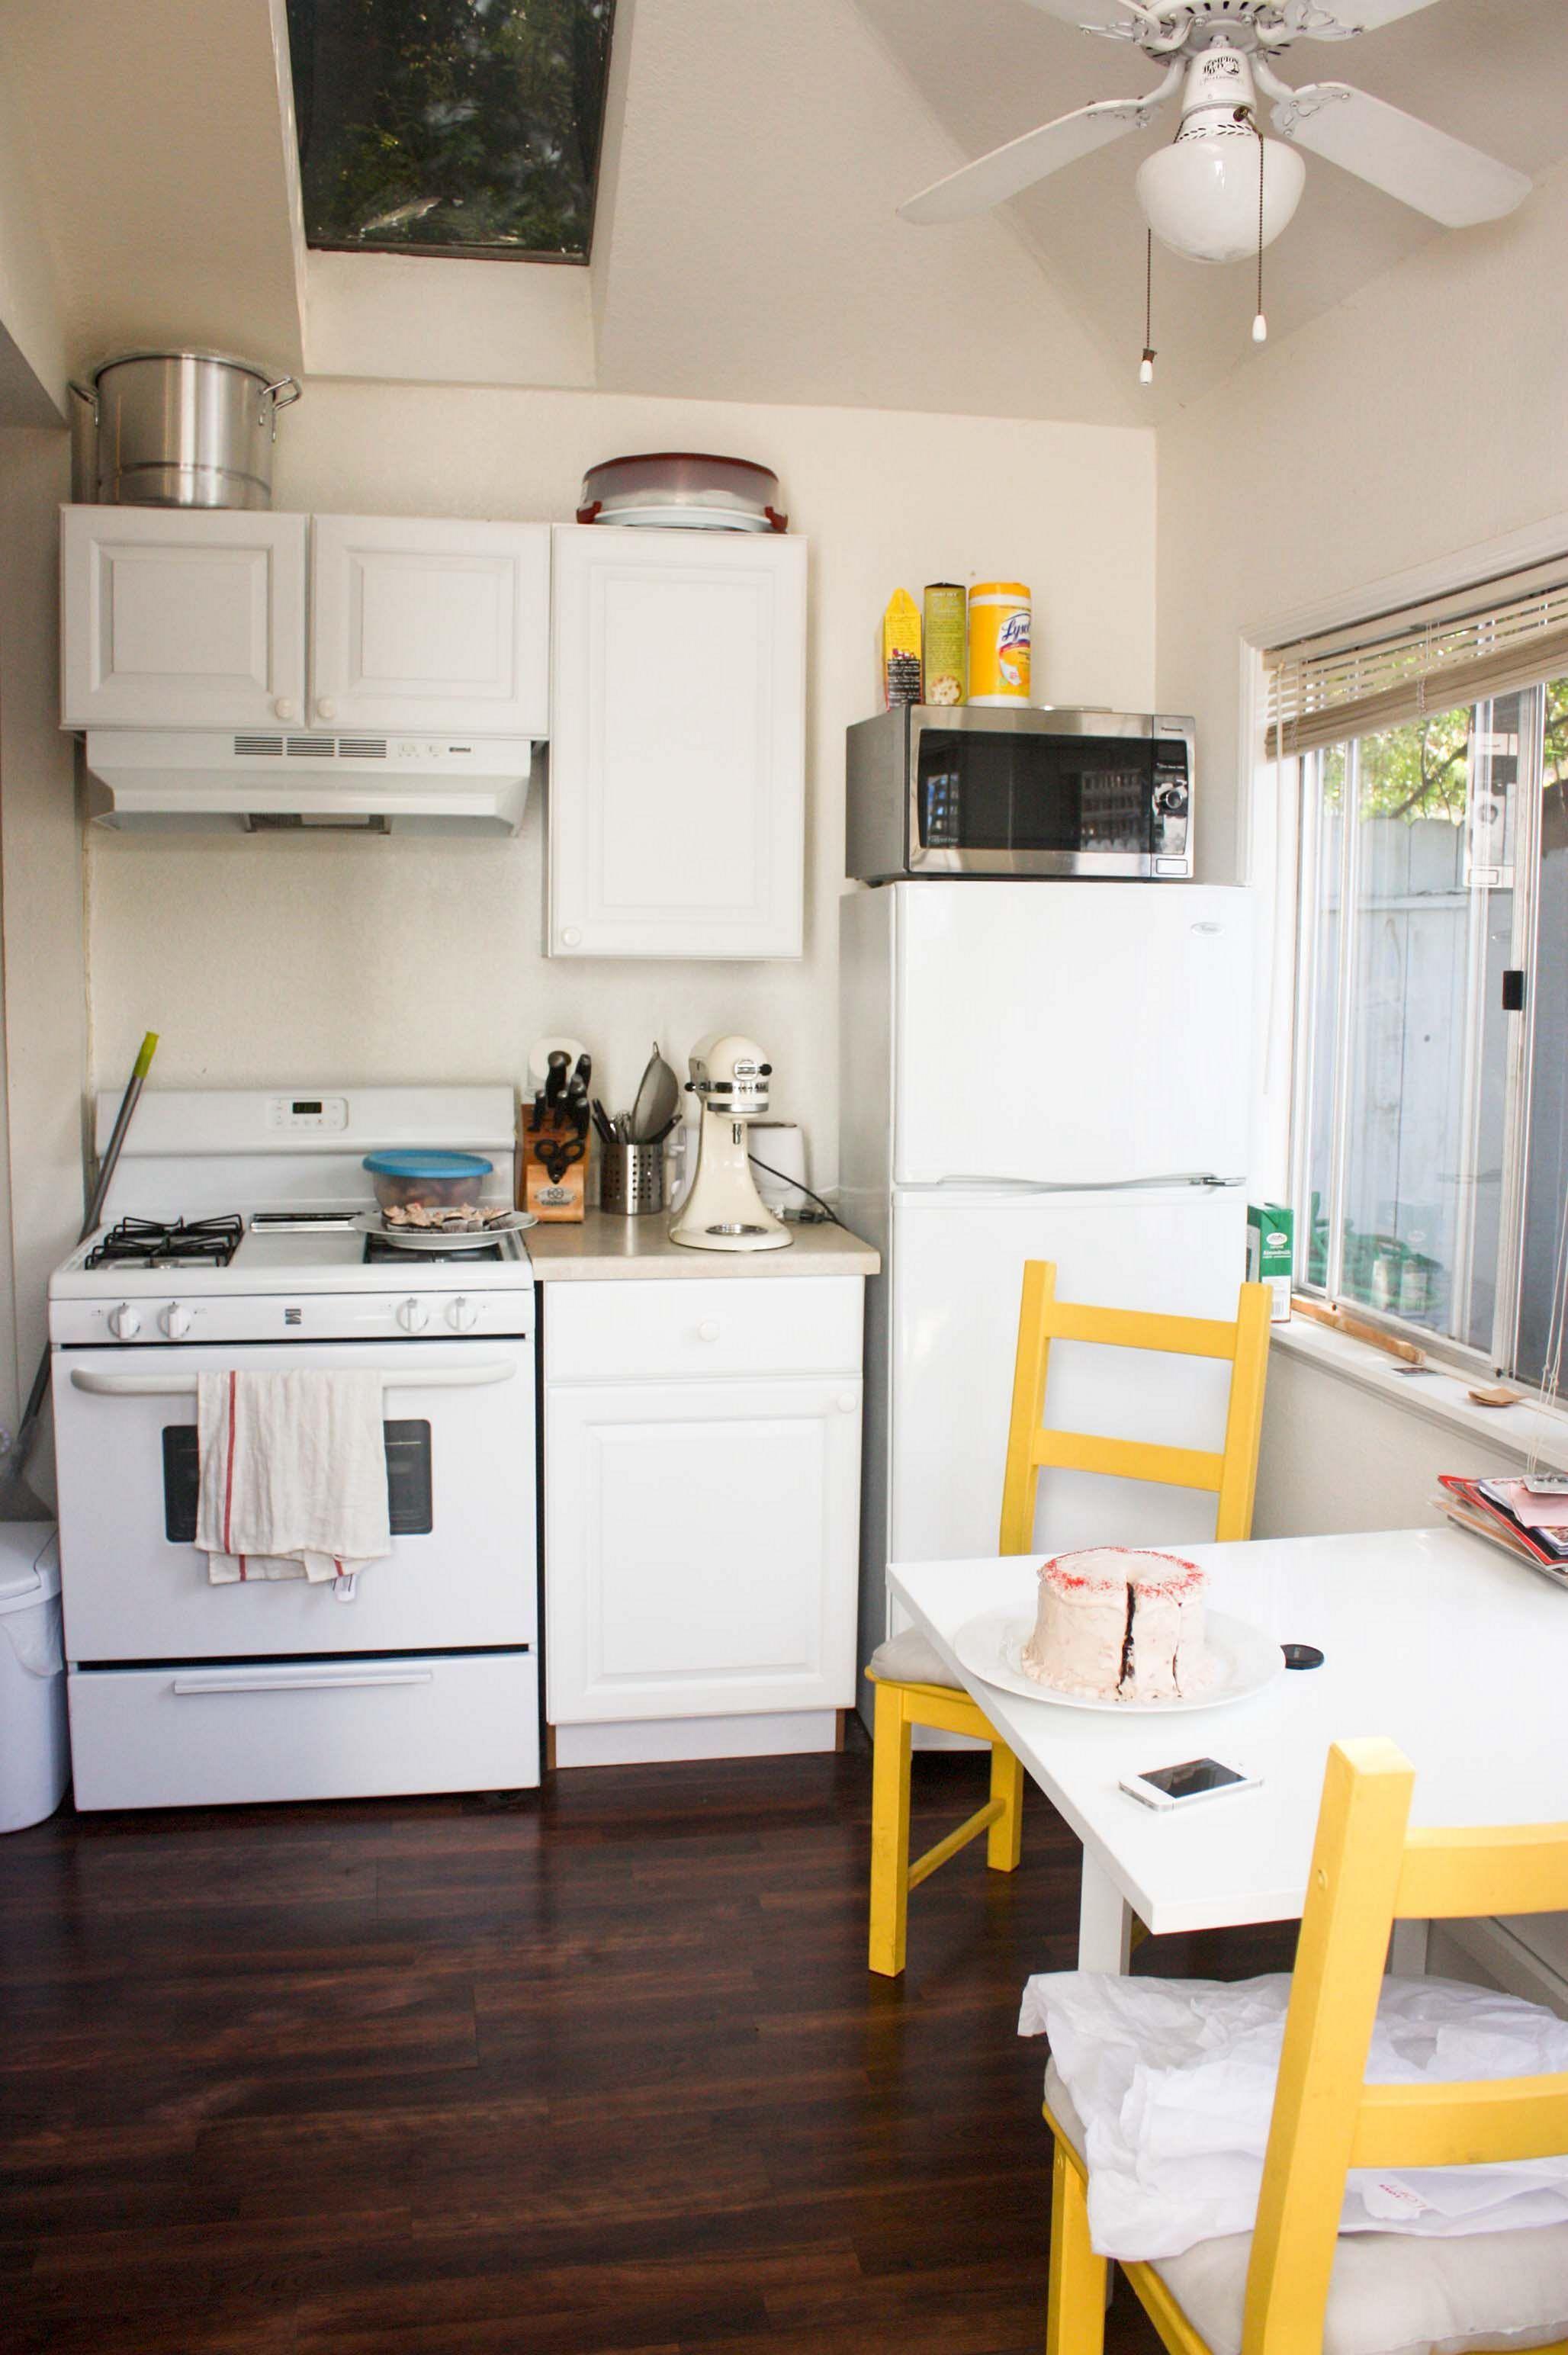 25+ Beautiful Tiny Kitchen Design For Cozy Kitchen Ideas